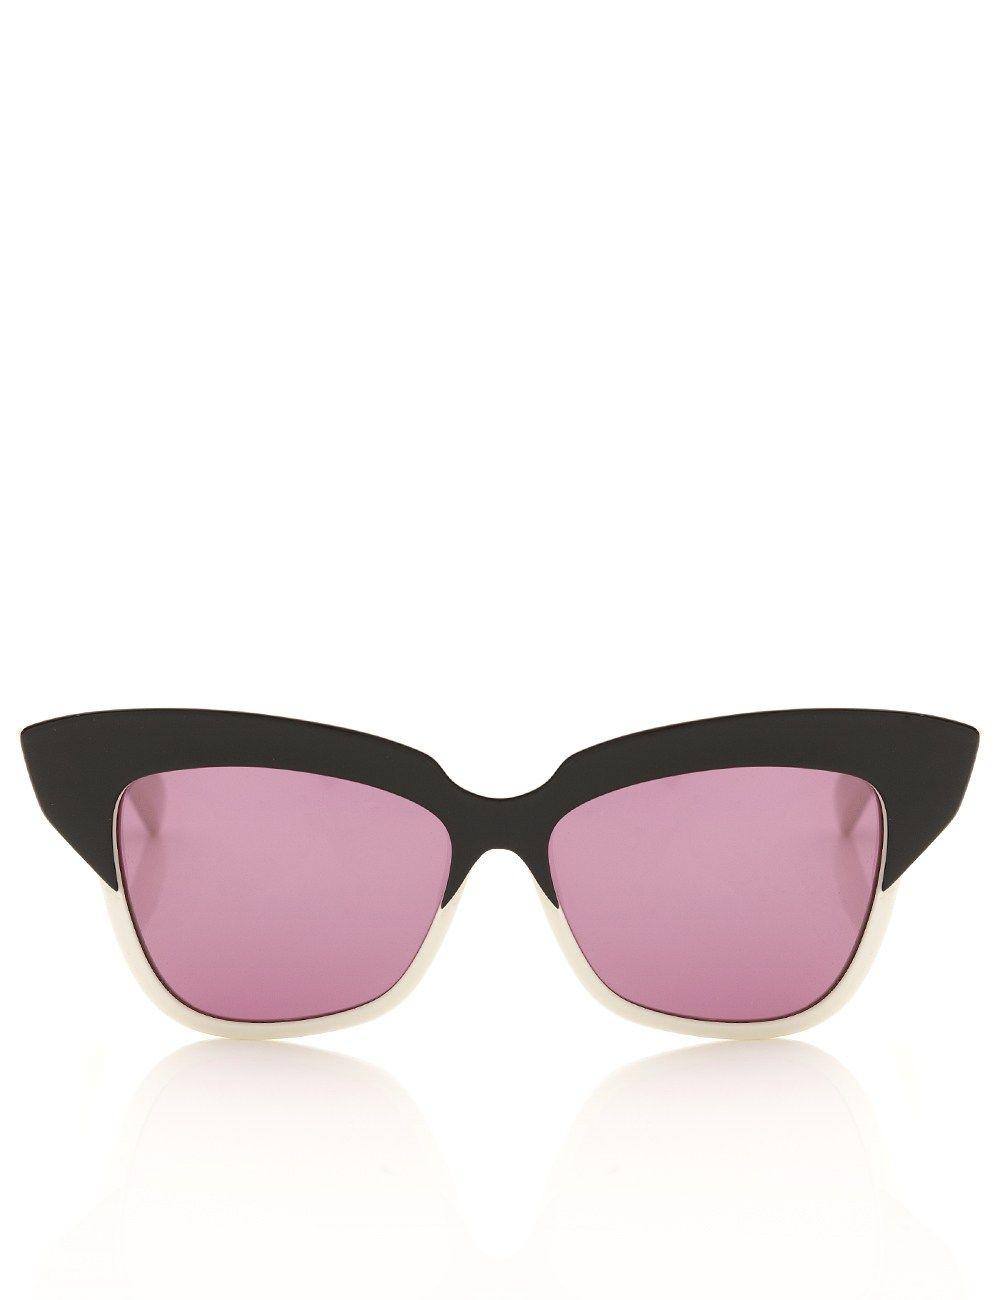 447763f8970d Monochrome Cat-Eye Sunglasses Wunderkind | Sunglasses/ Watches | Cat ...